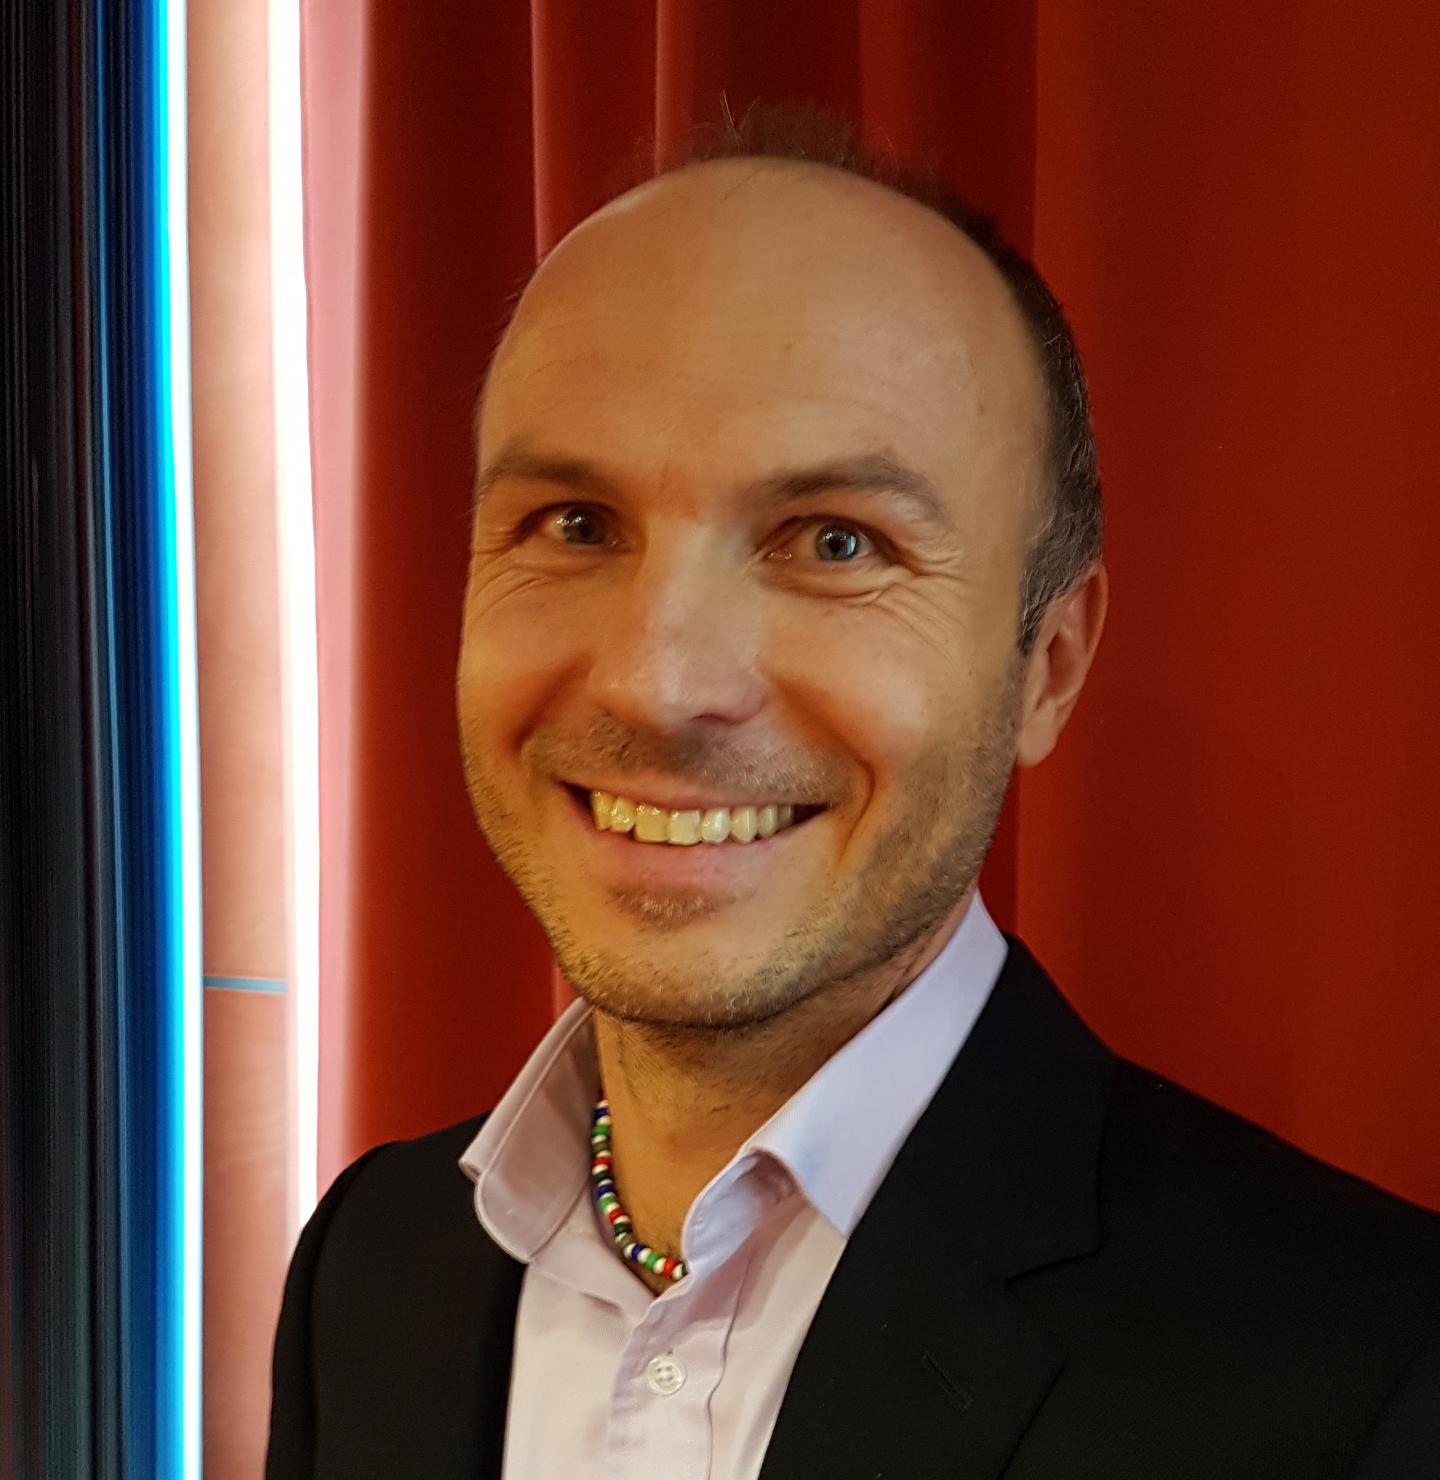 Karel Hanzlík